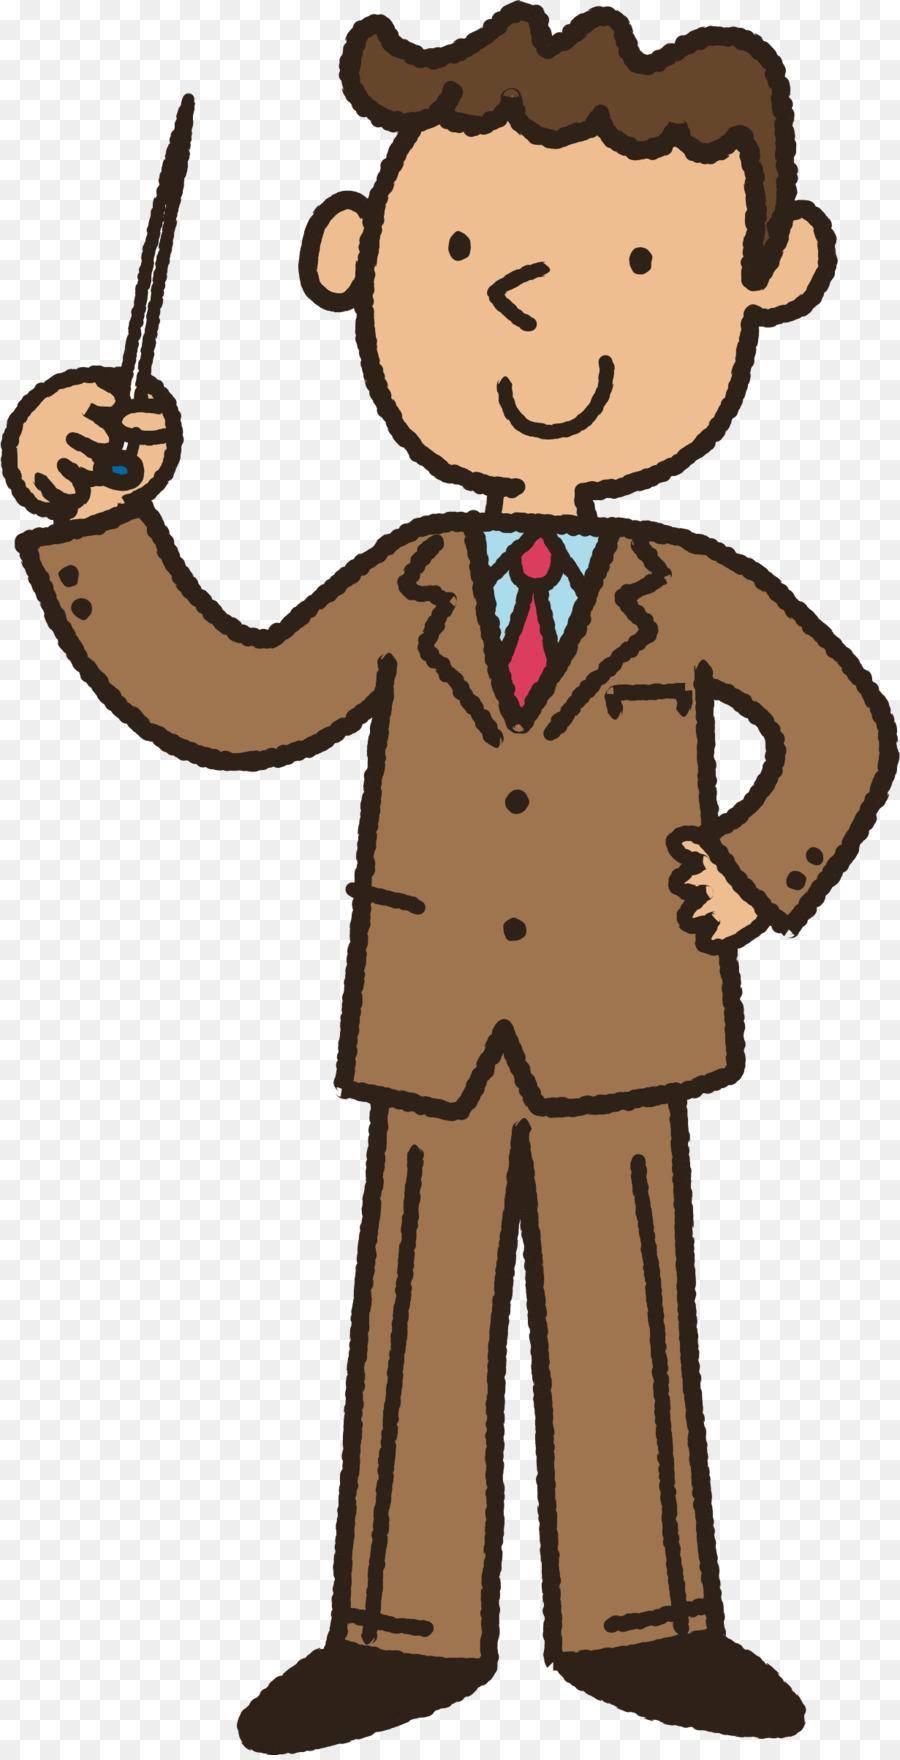 A male clipart clipart download Man Cartoon clipart - Teacher, Education, Man, transparent clip art clipart download